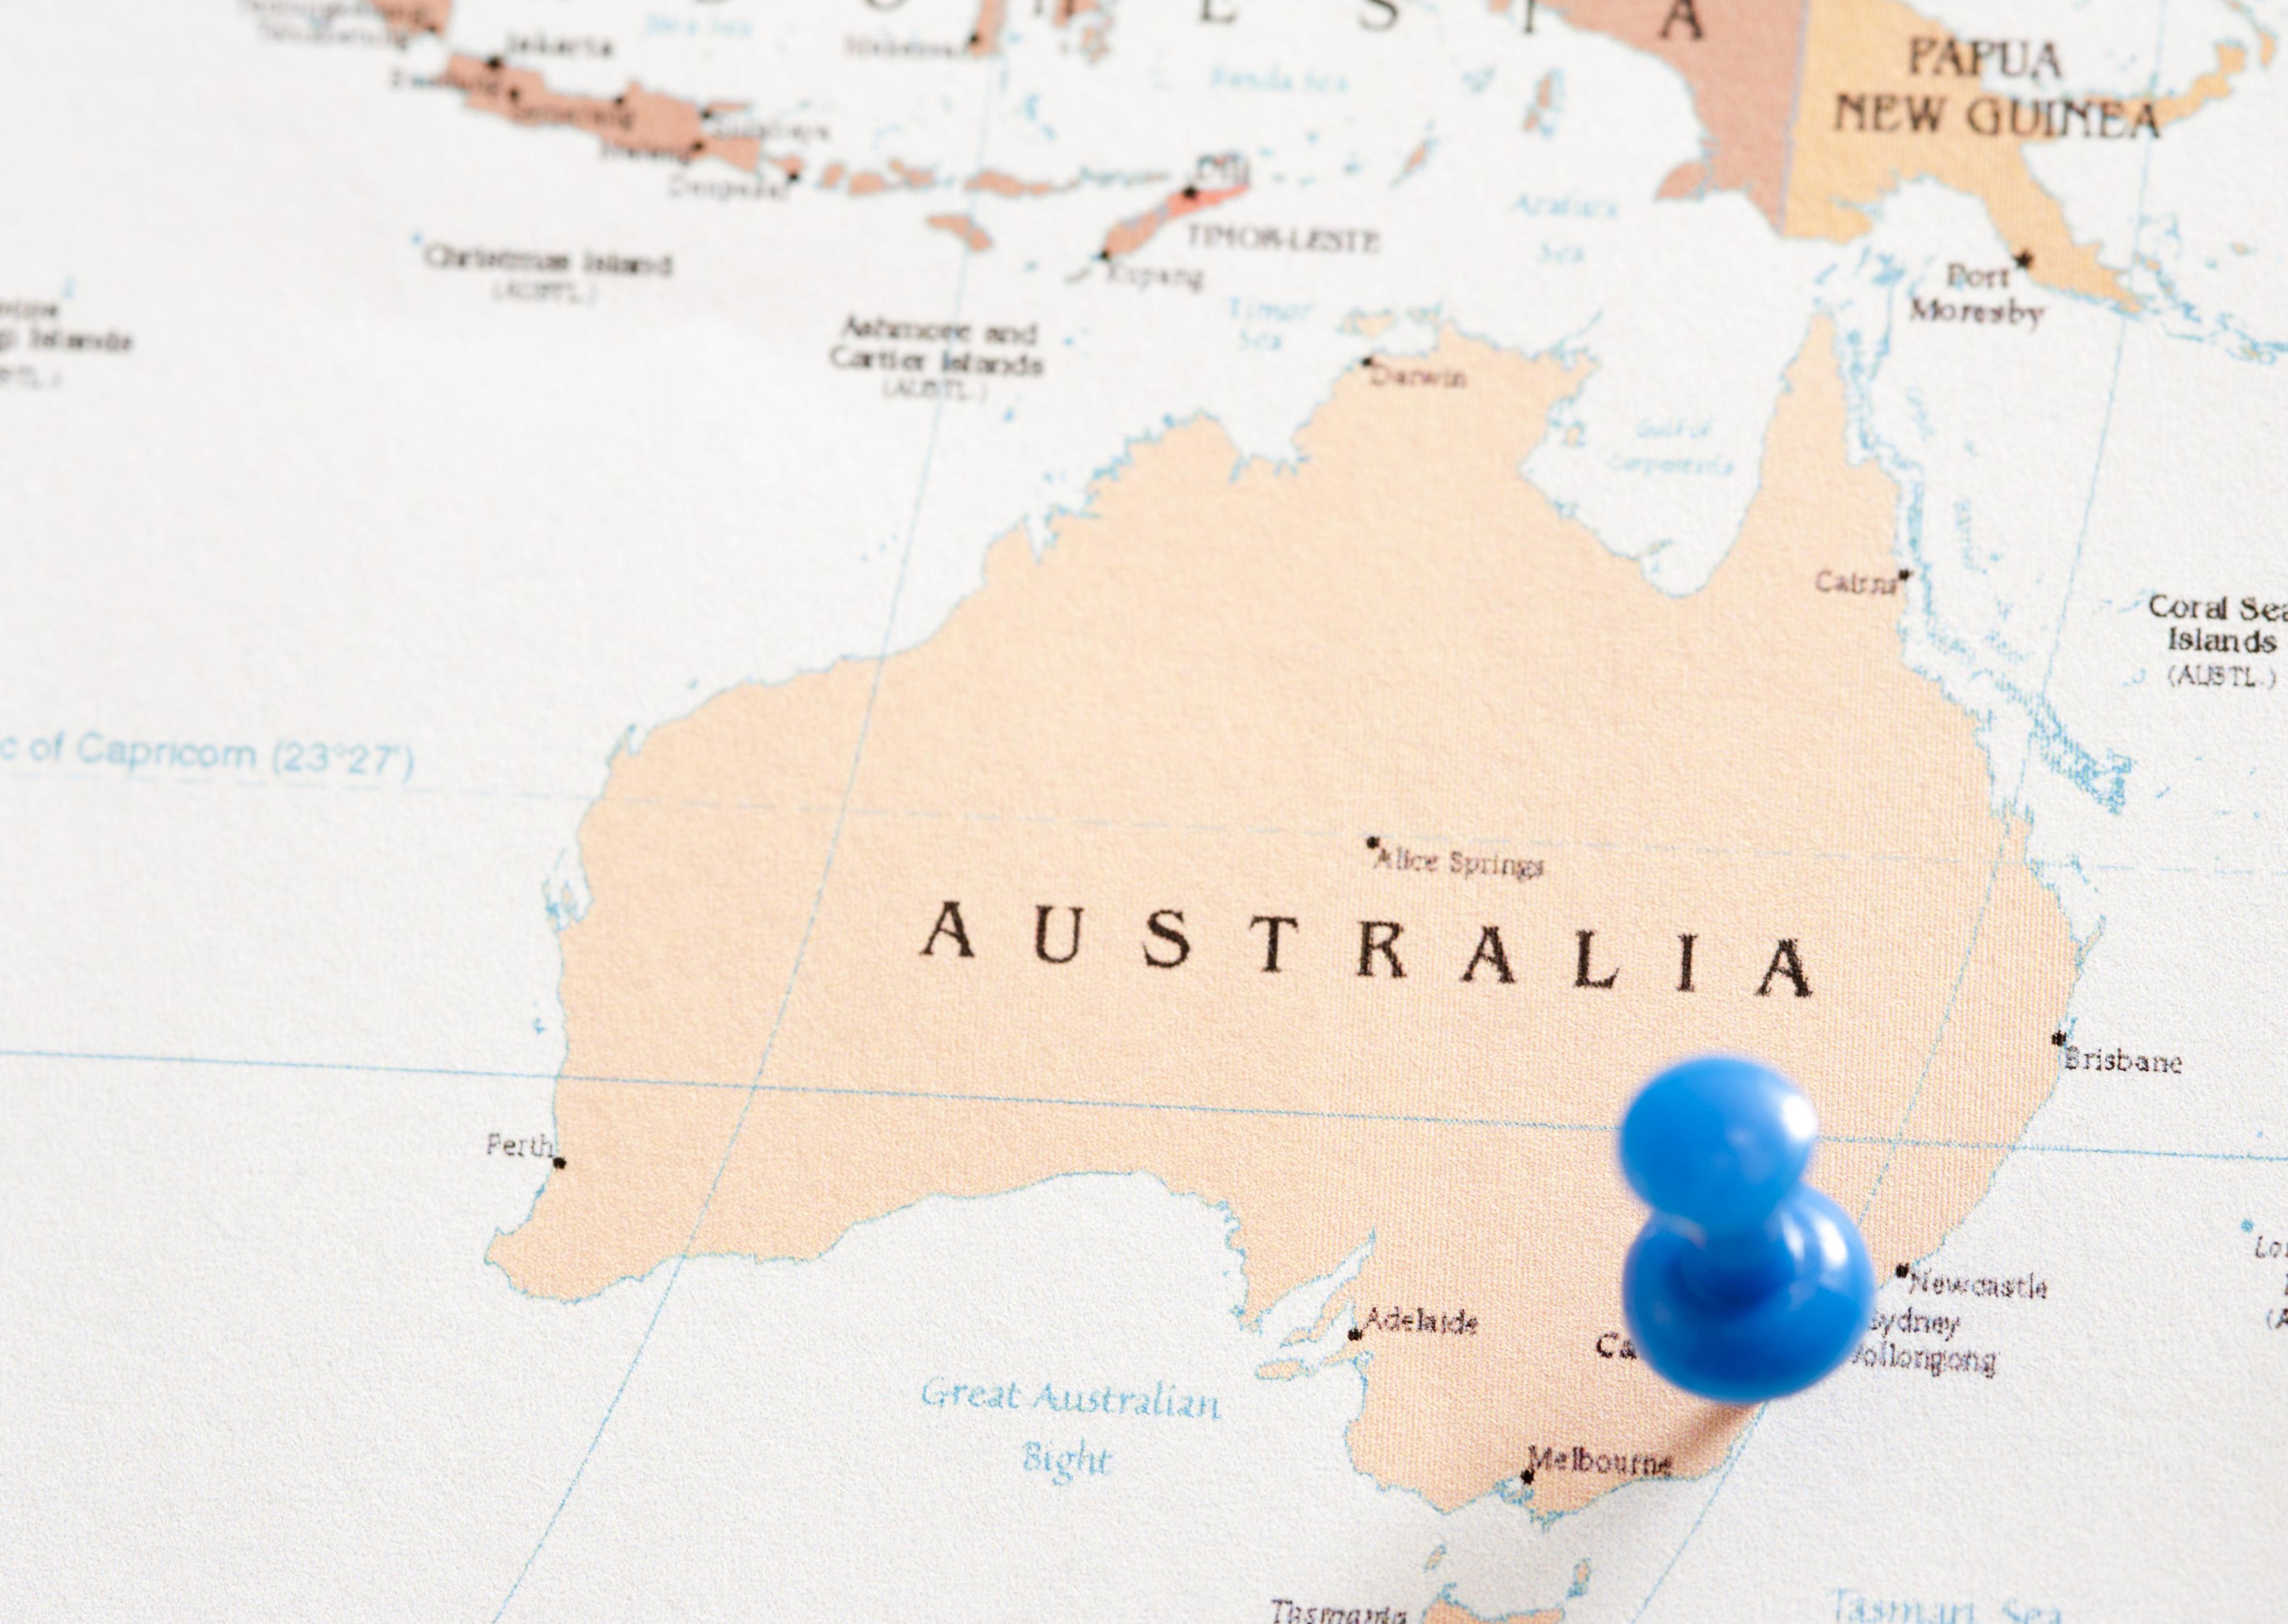 East Coast Map Of Australia.Image Of Pin Marking East Coast Location On Australian Map